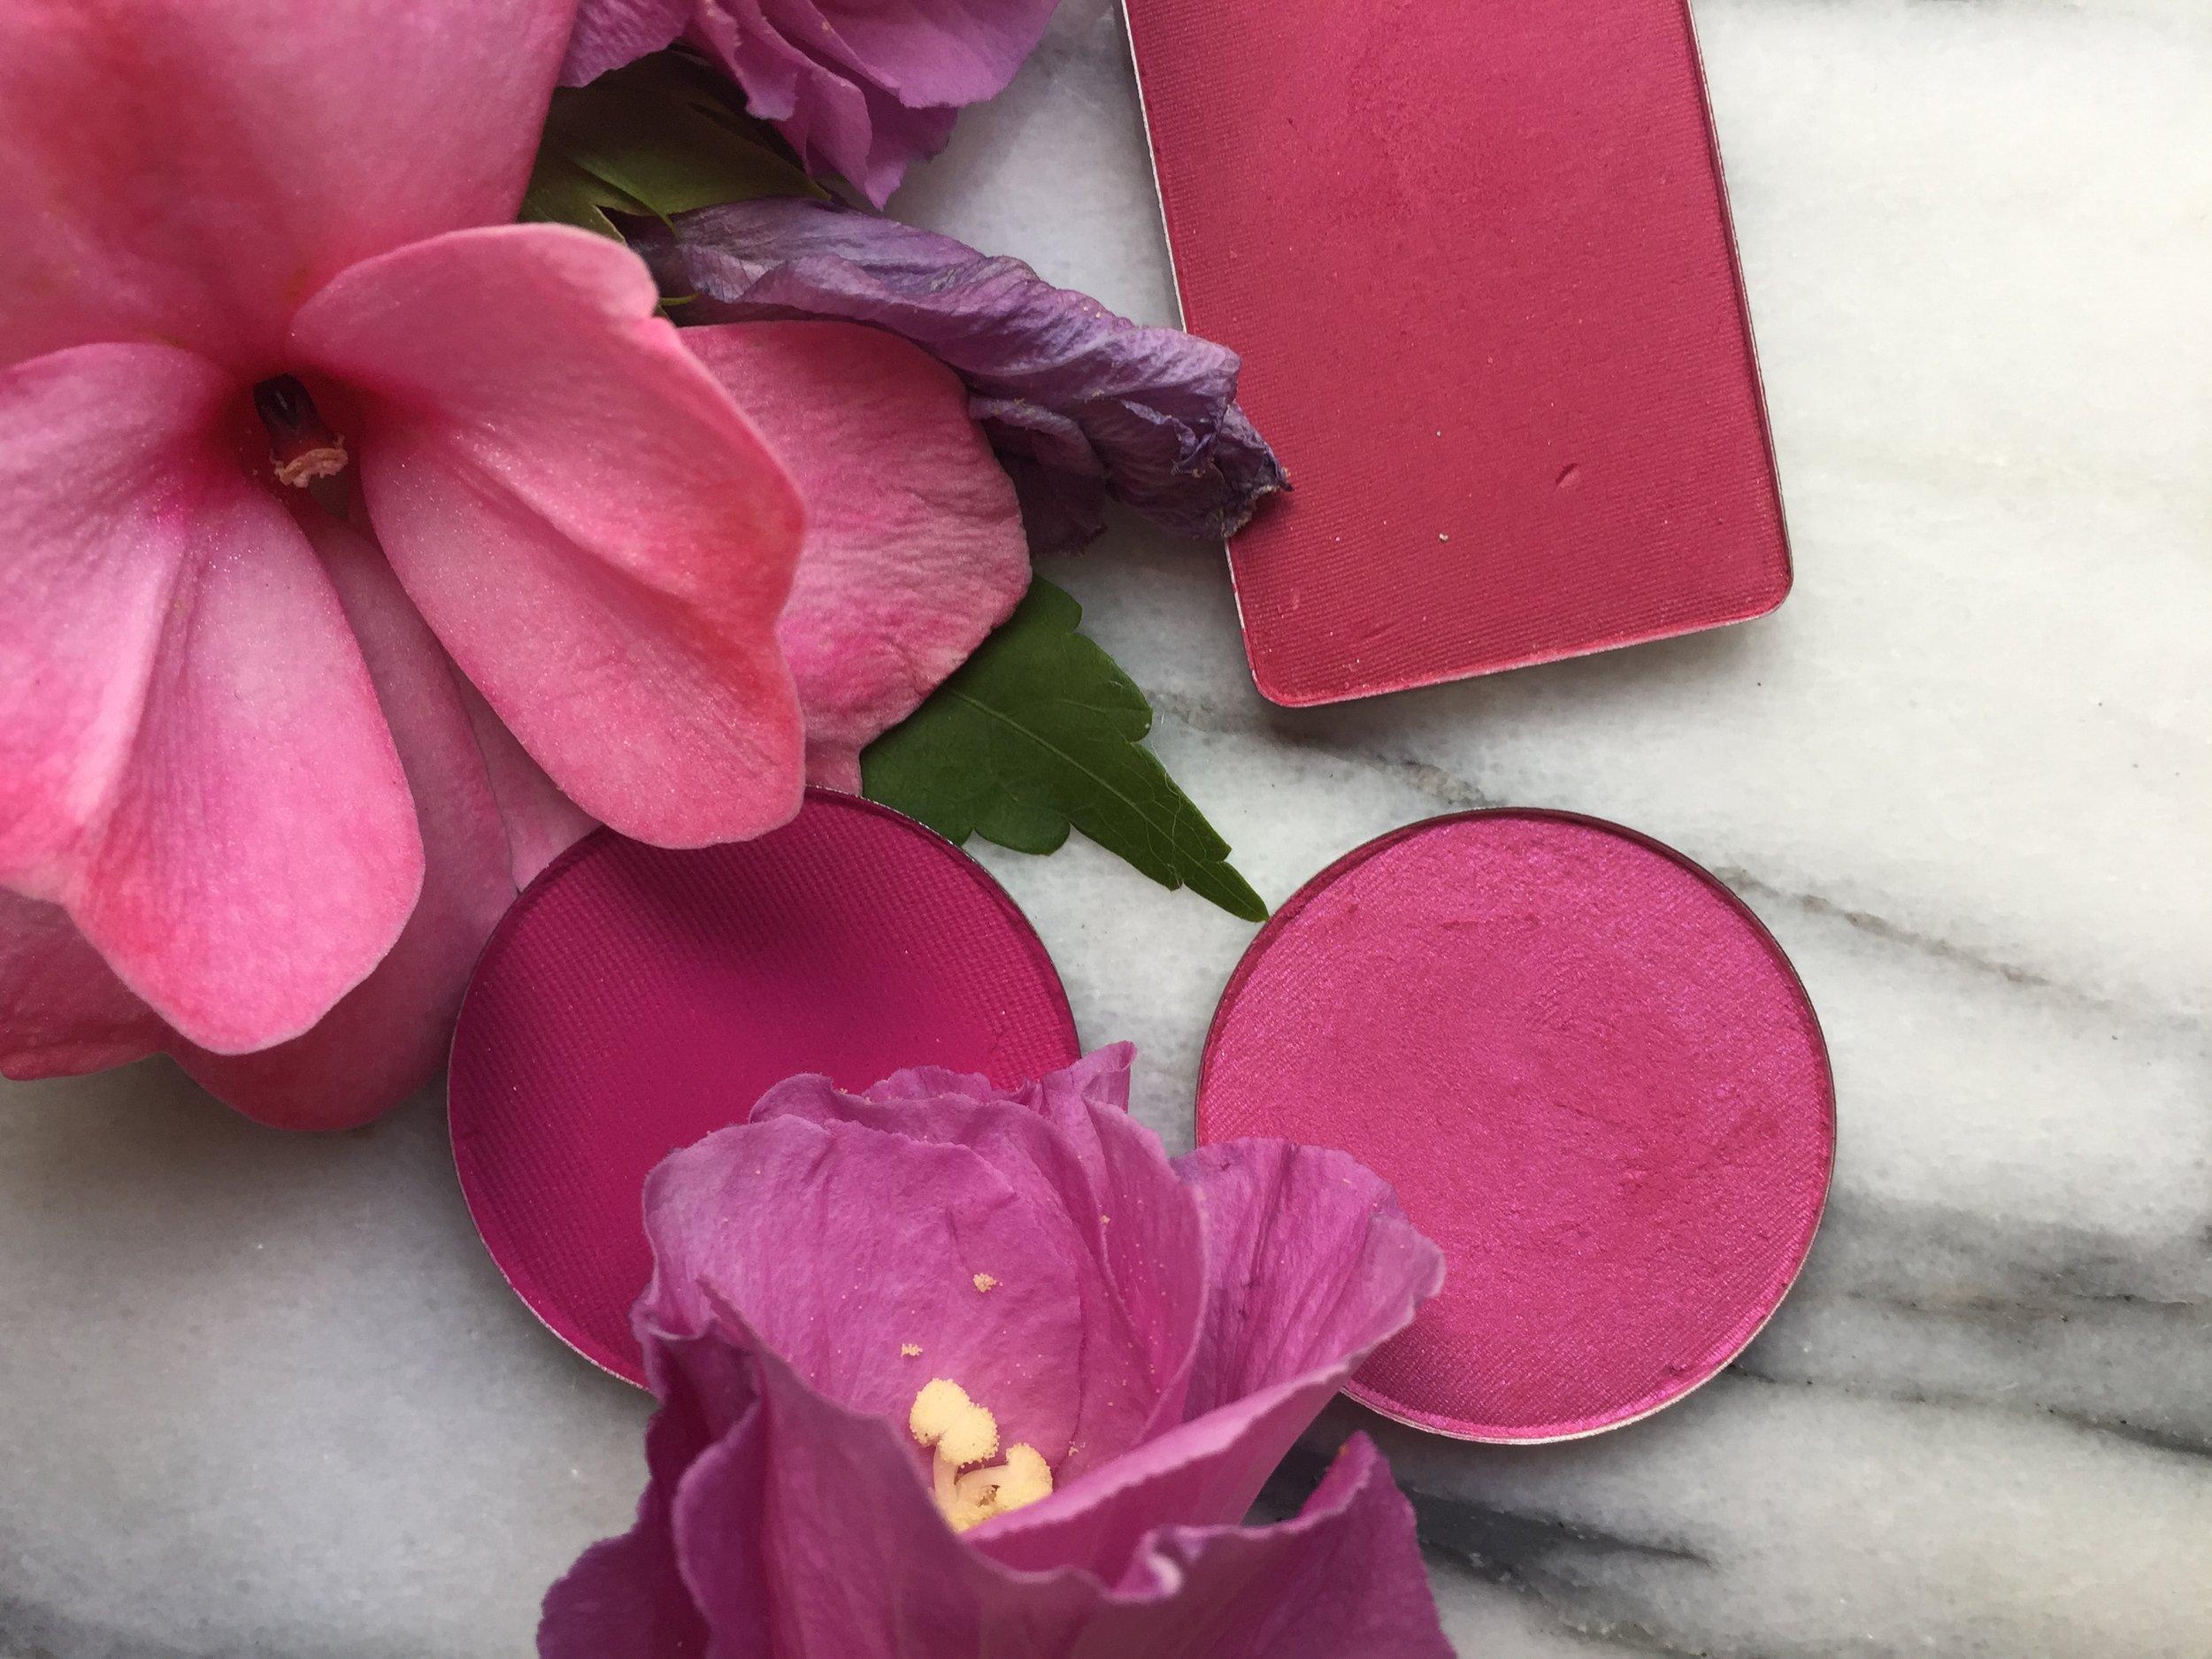 Berry Blushes | Inglot #63 AMC, La Femme Magenta and Rose Chiffon